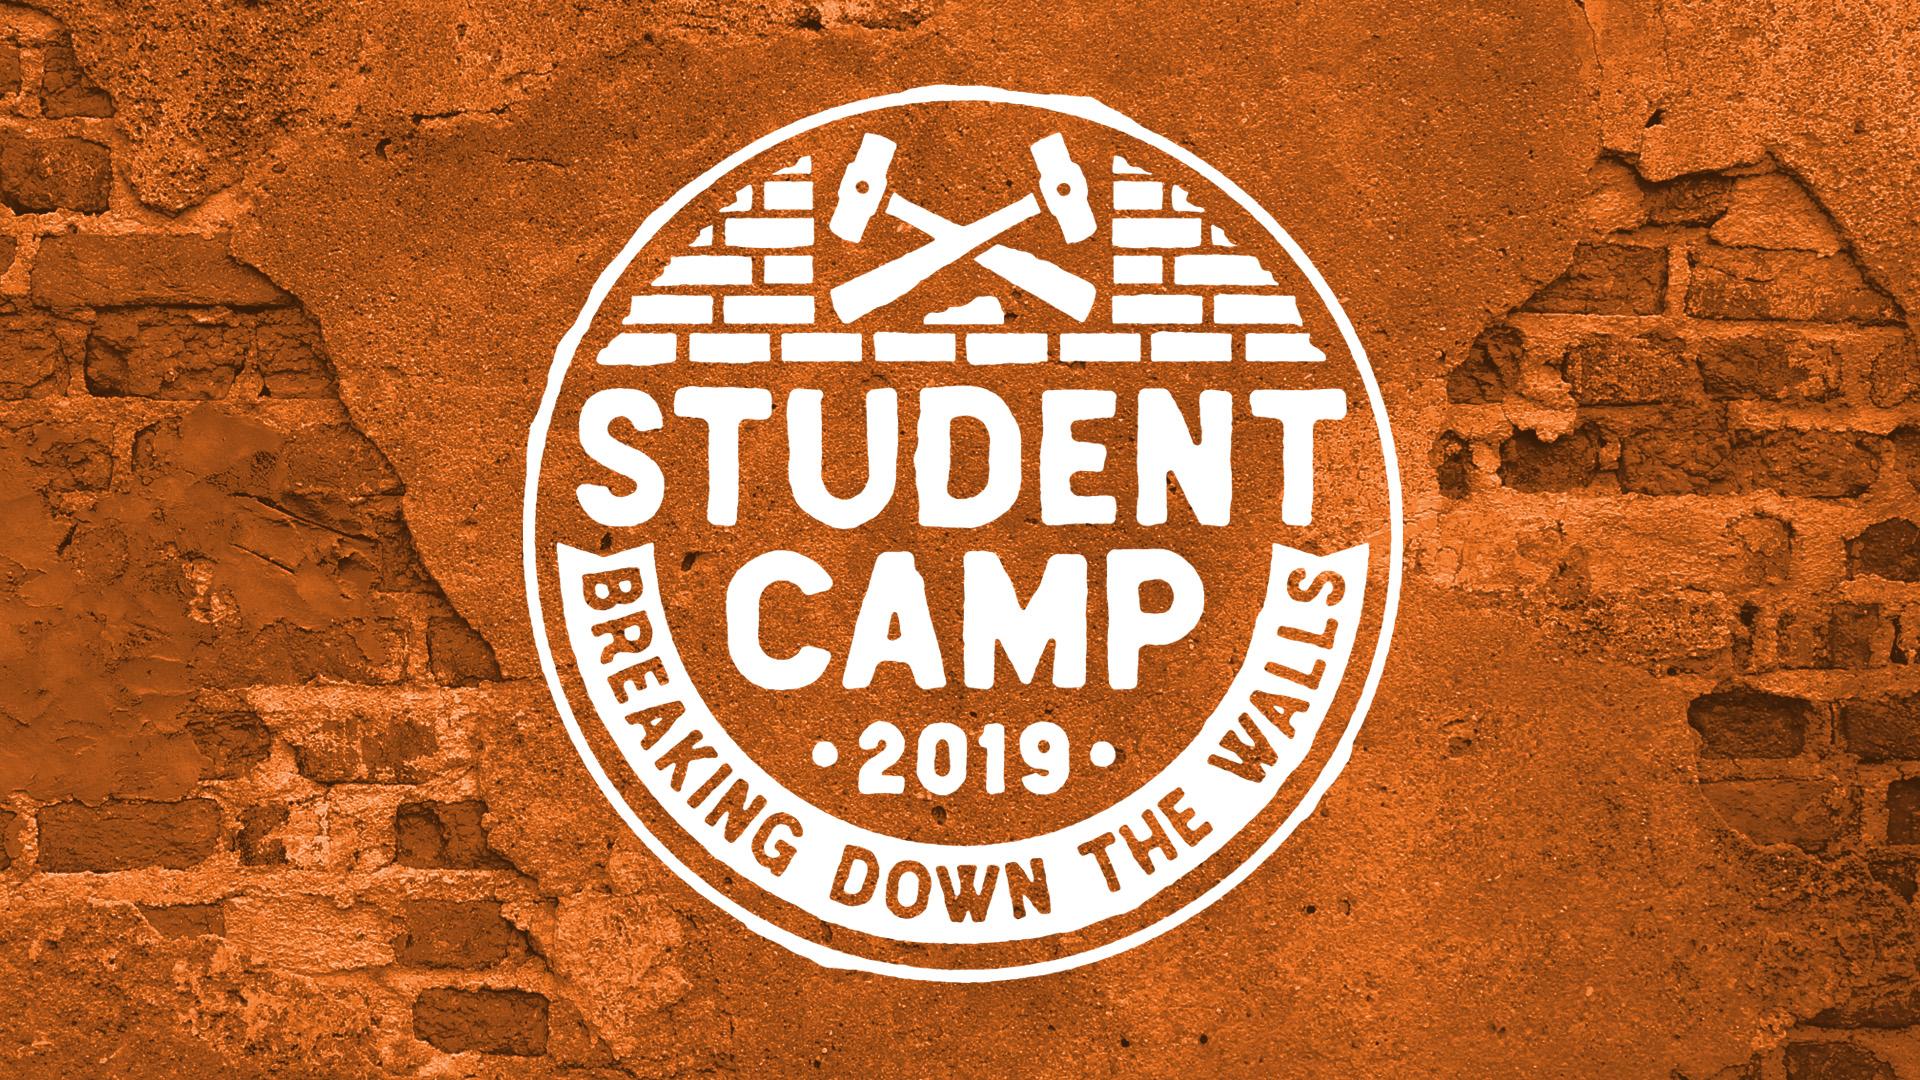 StudentCamp_2019_1920x1080.jpg